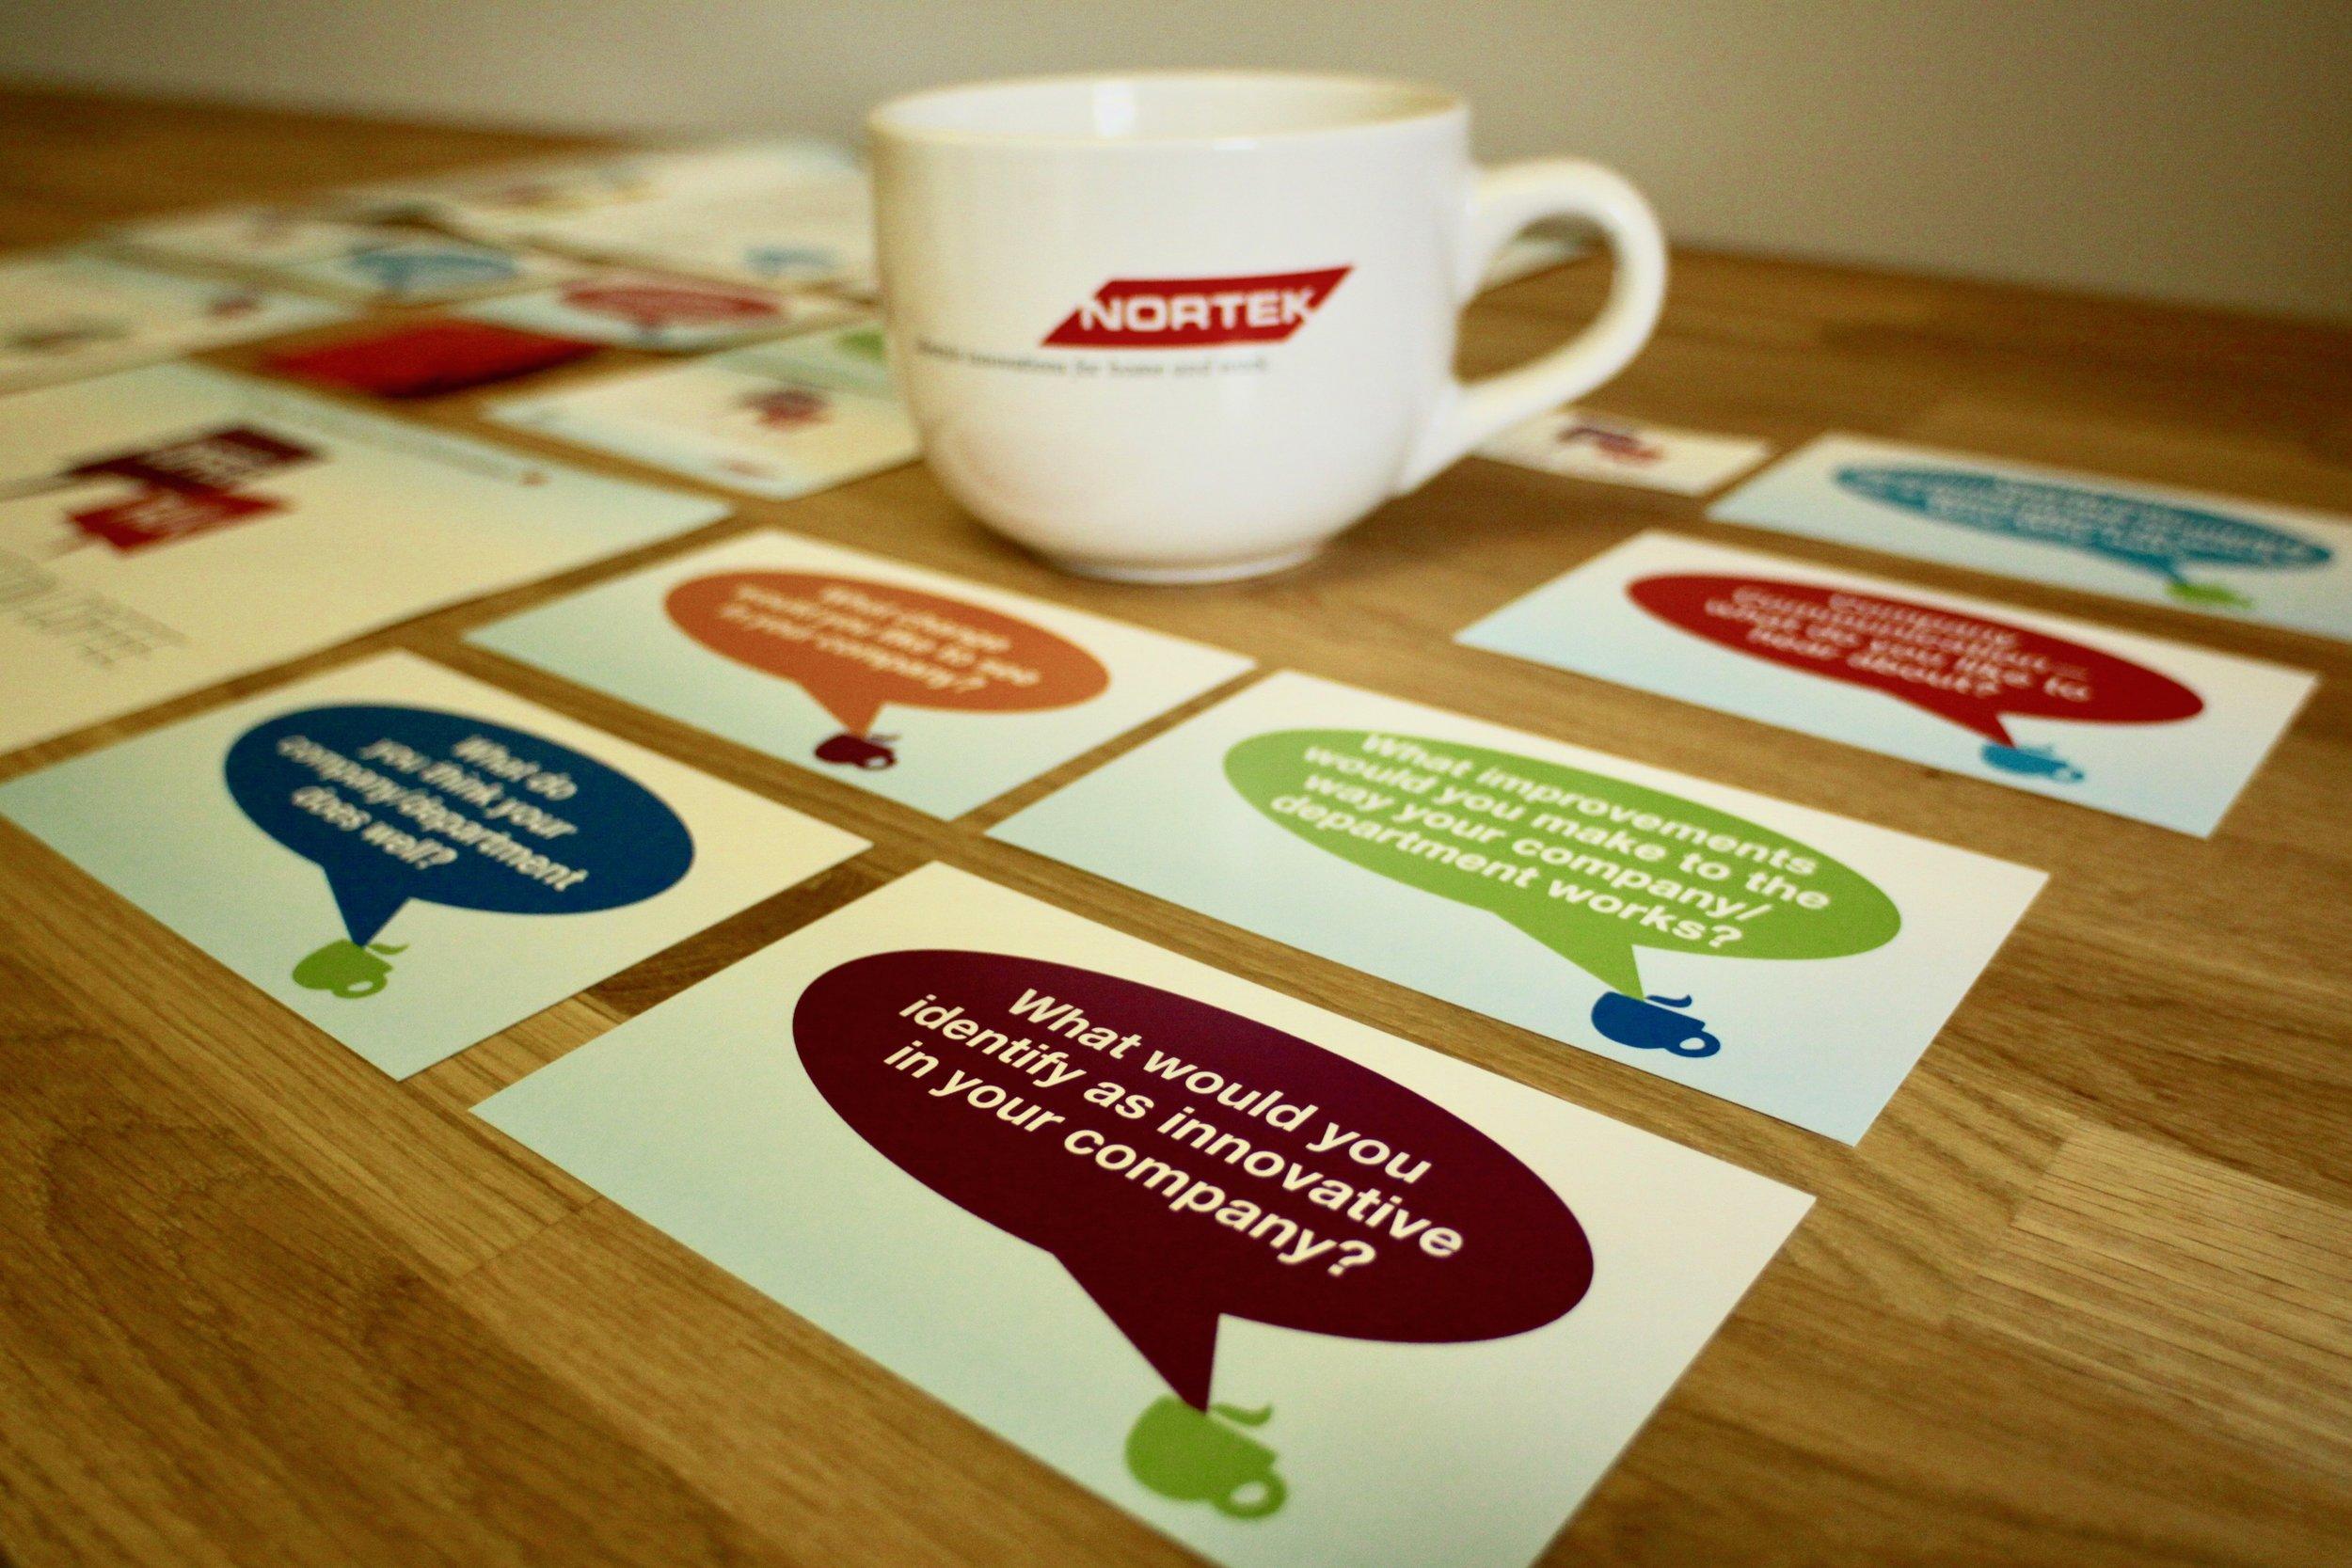 Coffee Talk Communication